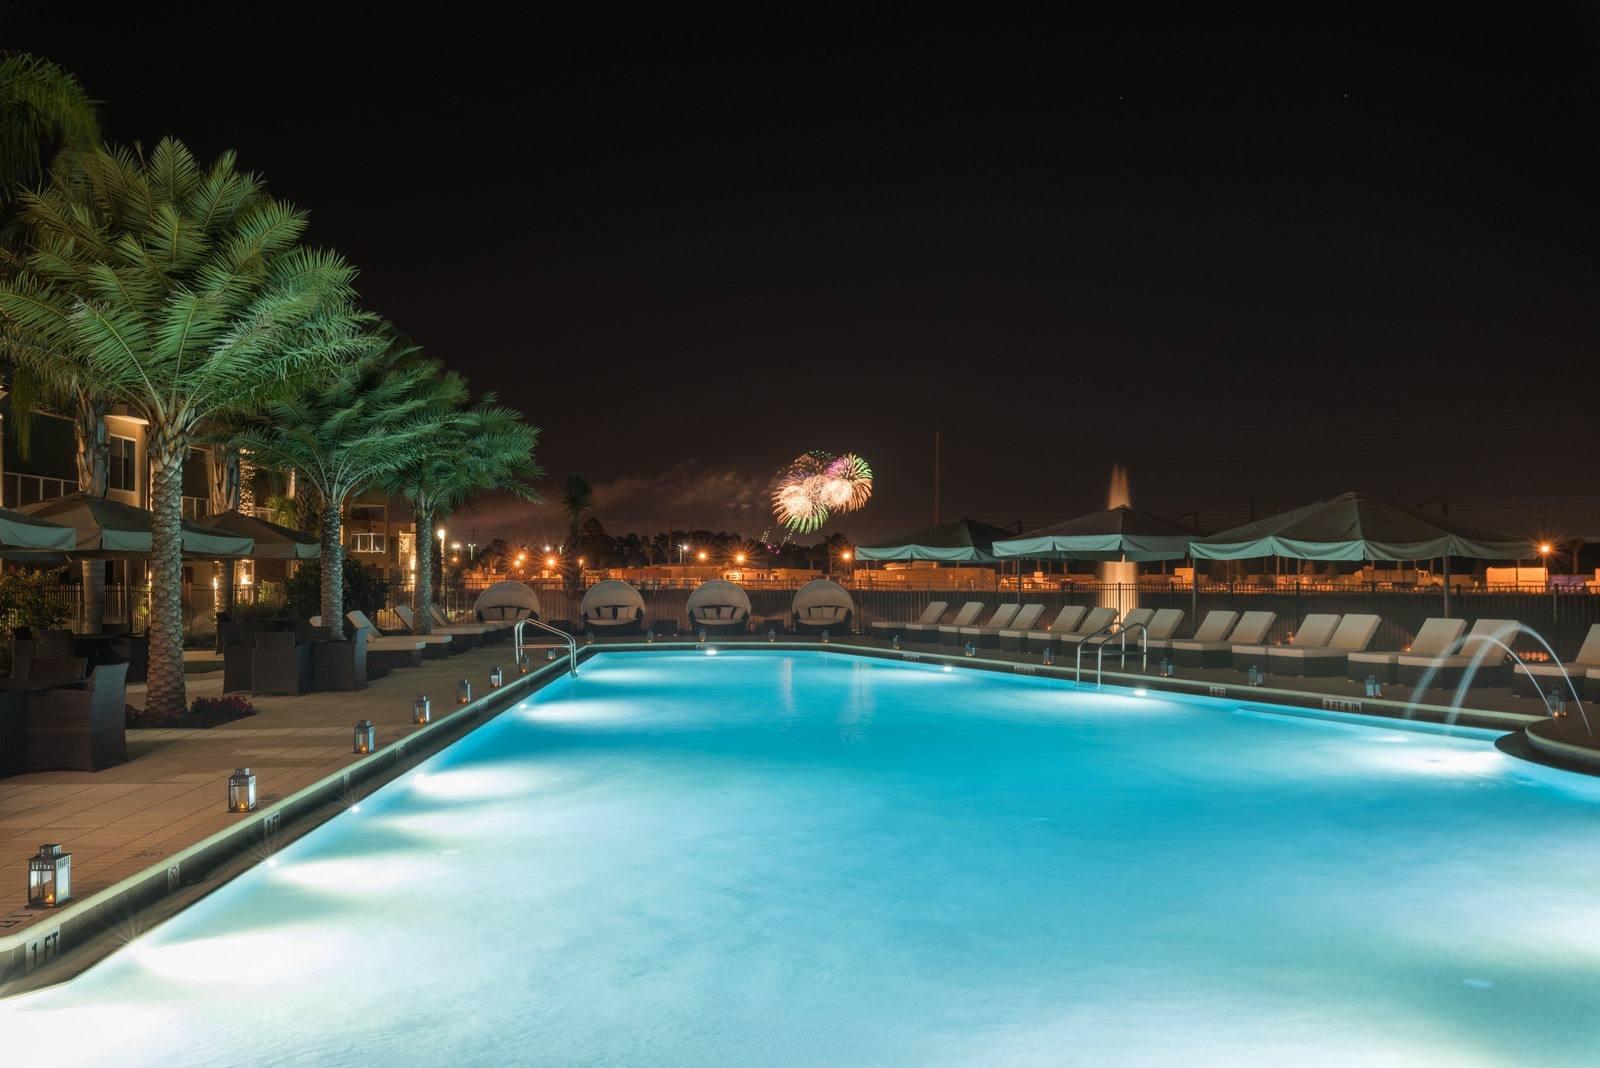 Magic-Village-Pool-Fireworks